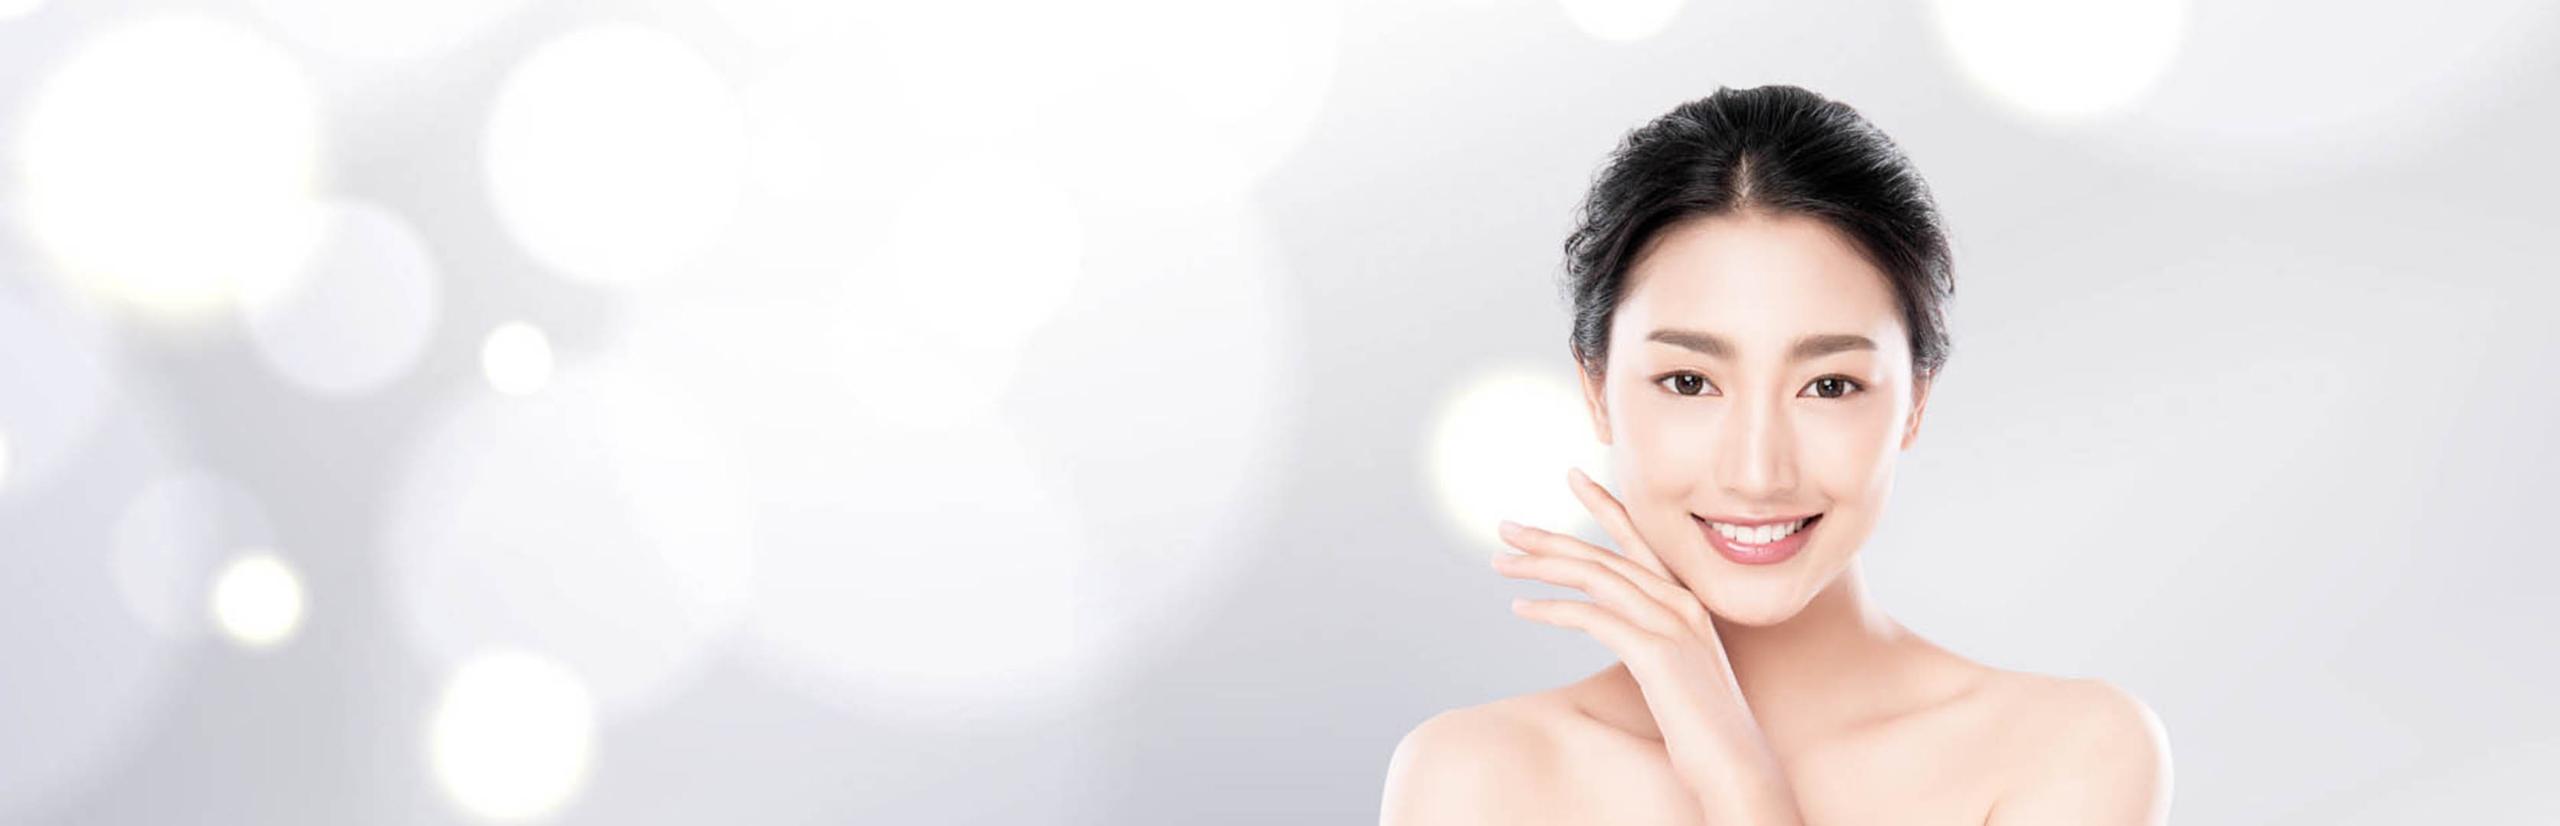 ArtisanWellness.sg - Led light therapy (@artisanwellness) Cover Image